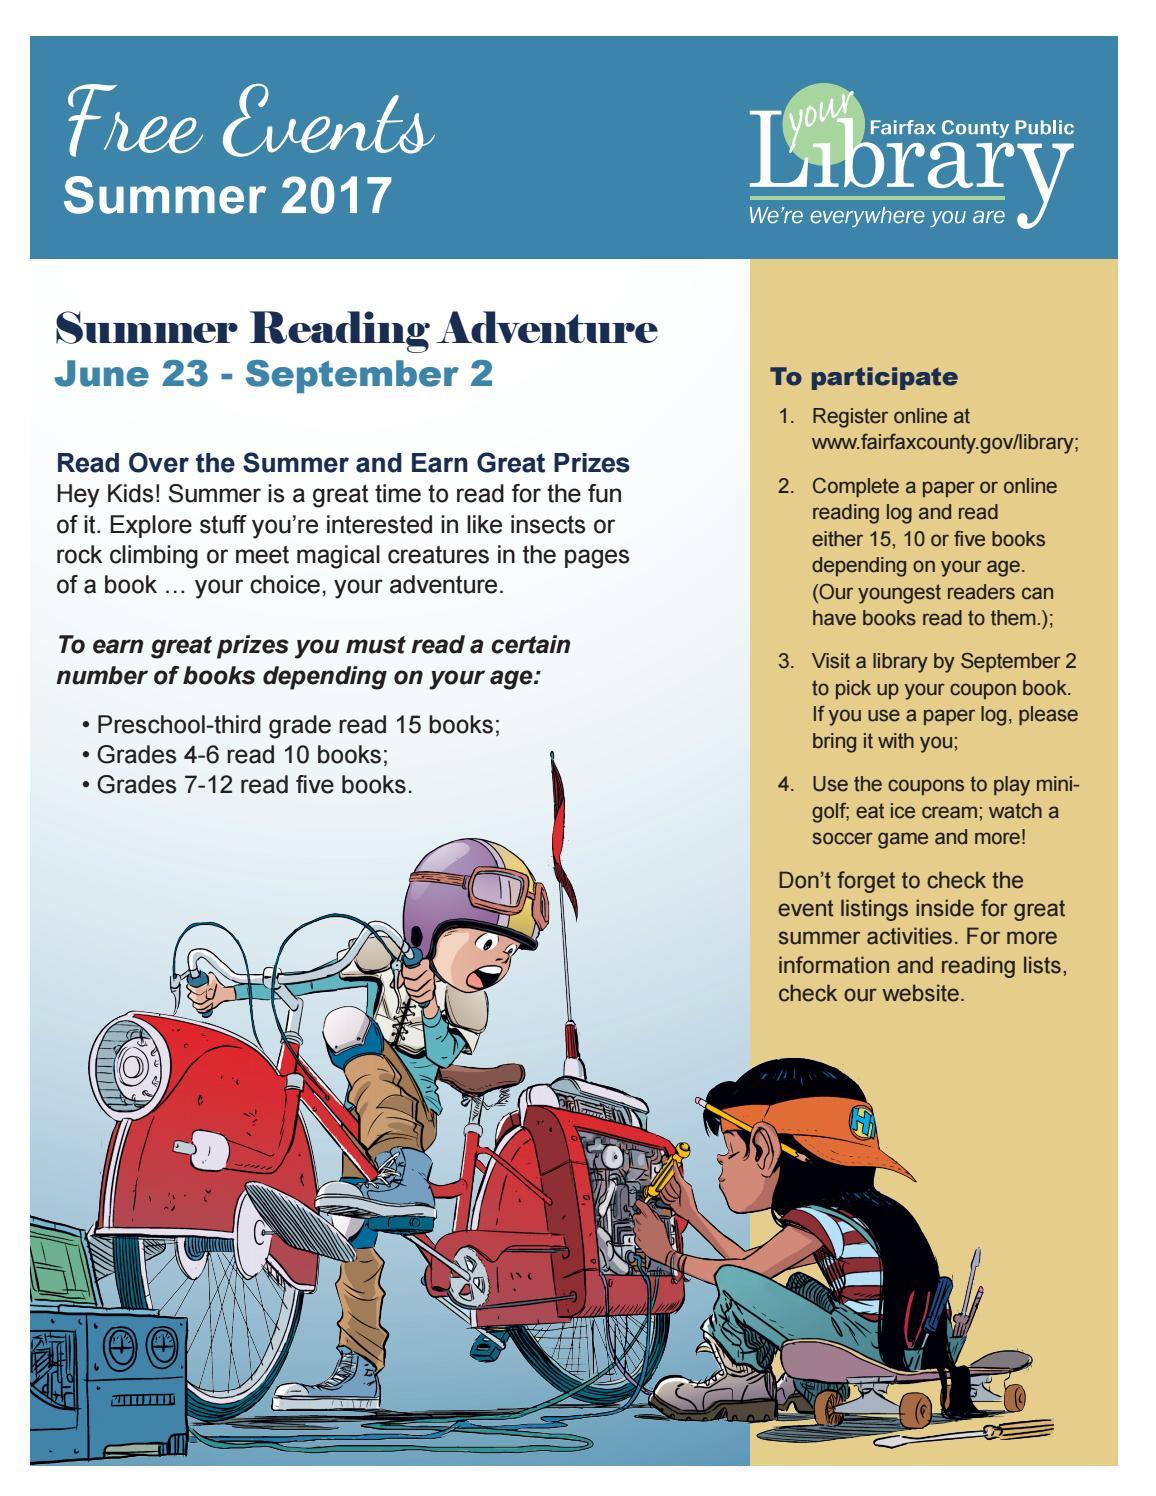 Summer 2017 Free Events Calendar by Fairfax County Public Library - issuu